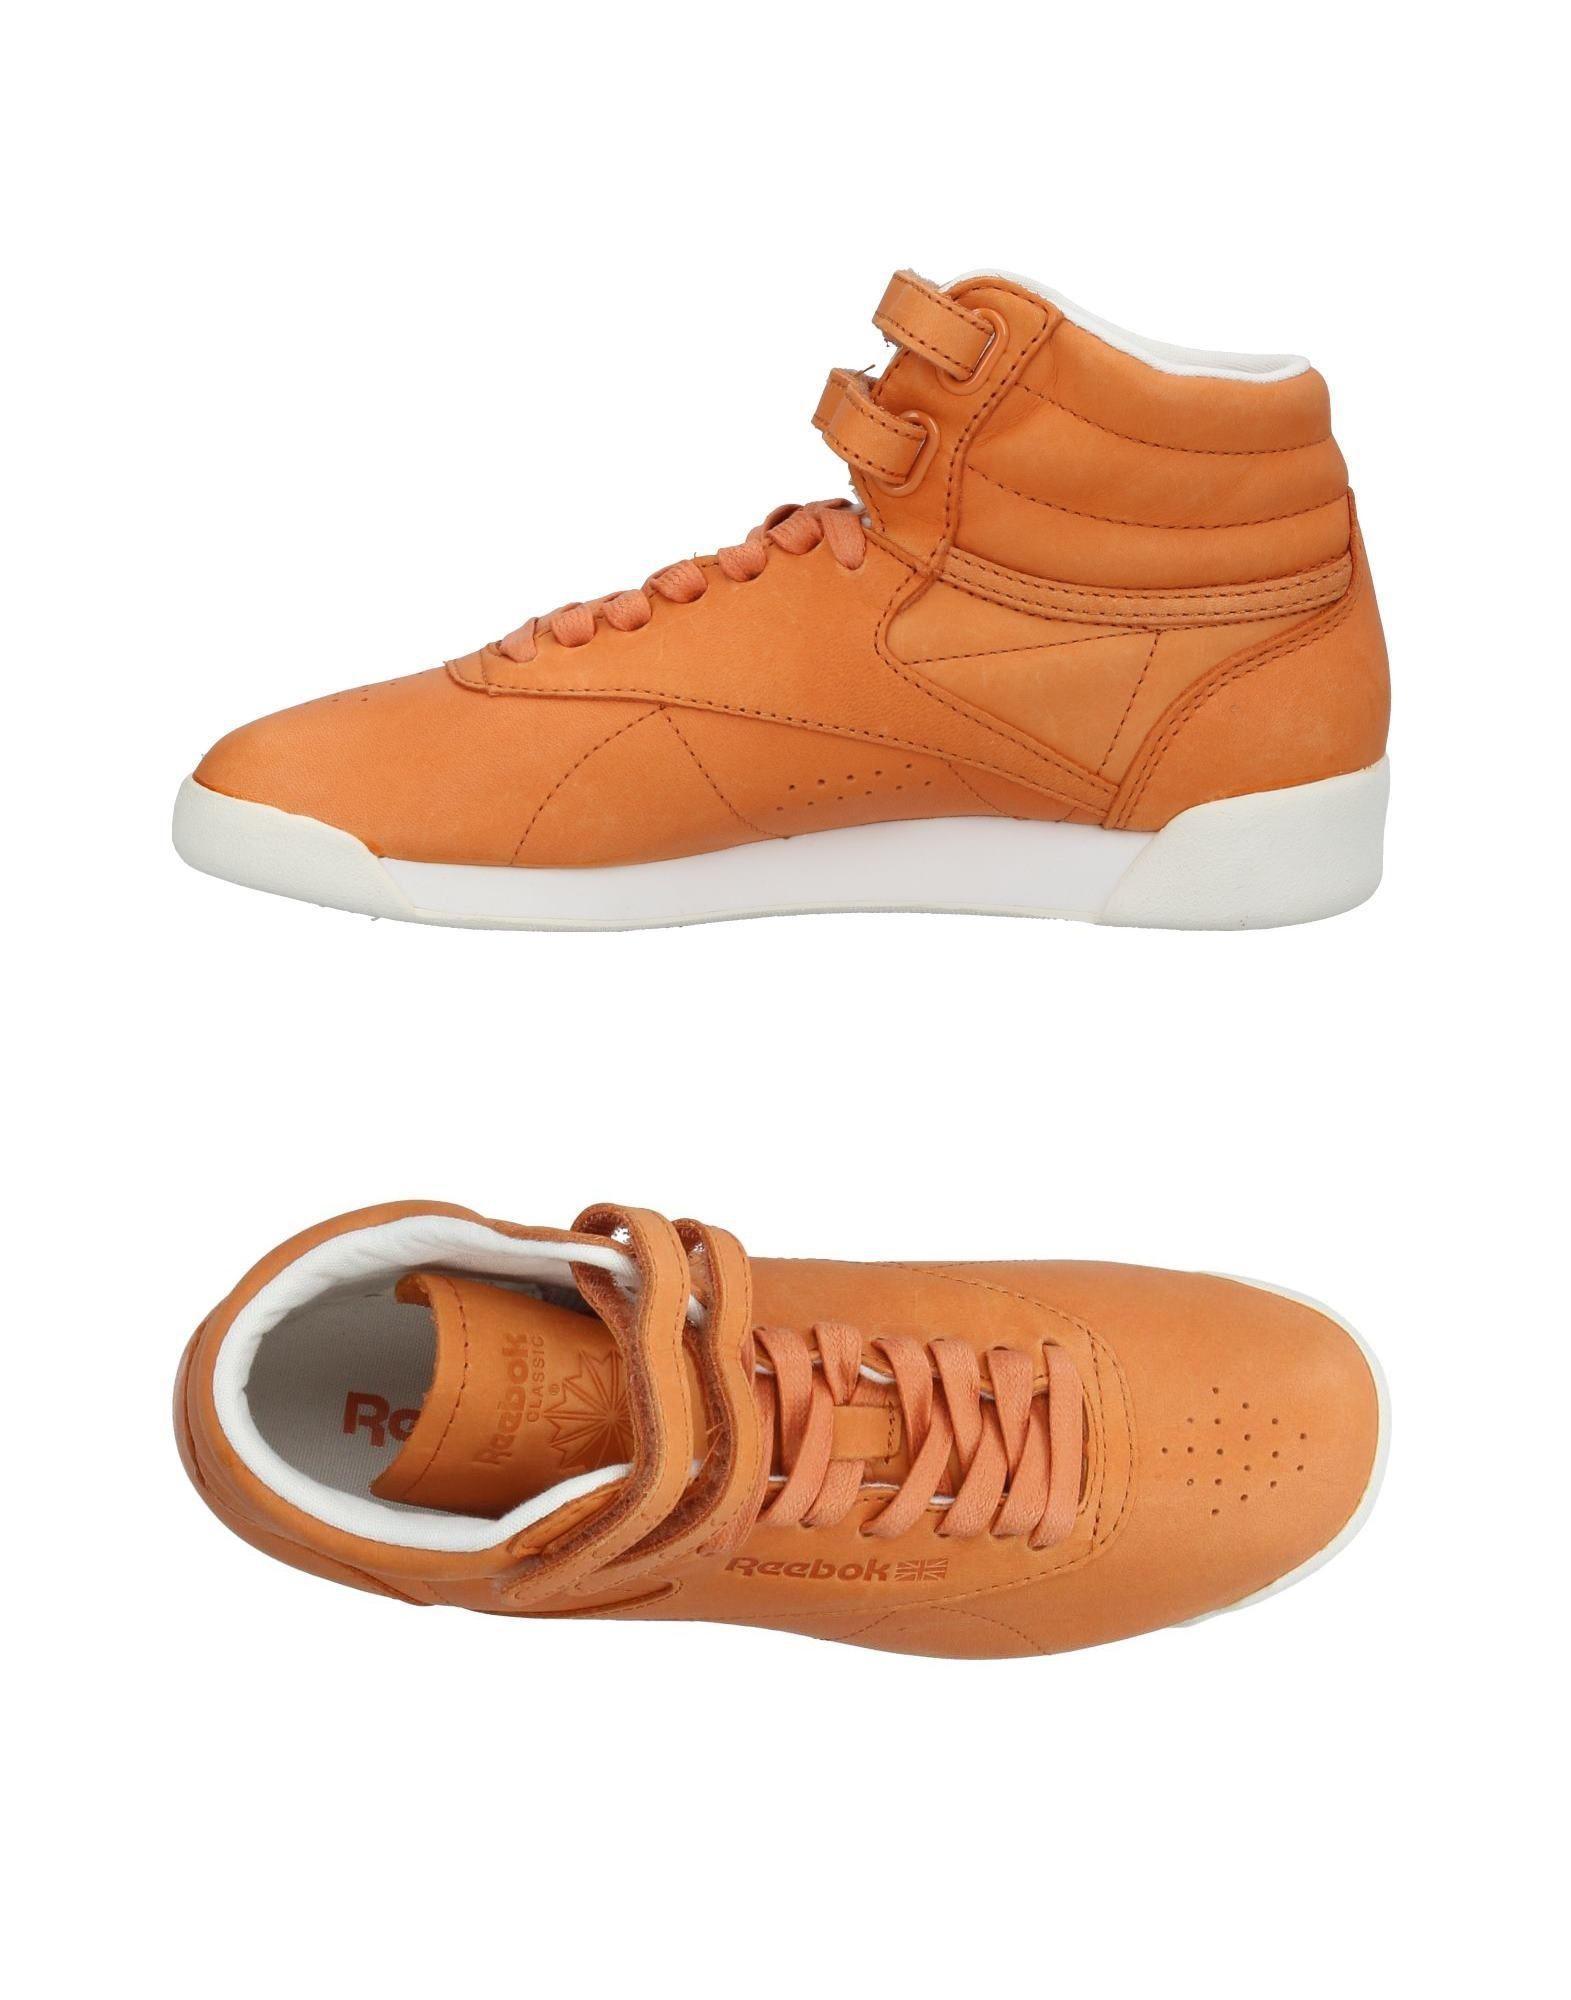 In Lyst Sneakers For High Men Brown Reebok Topsamp; wOiuTPXkZ